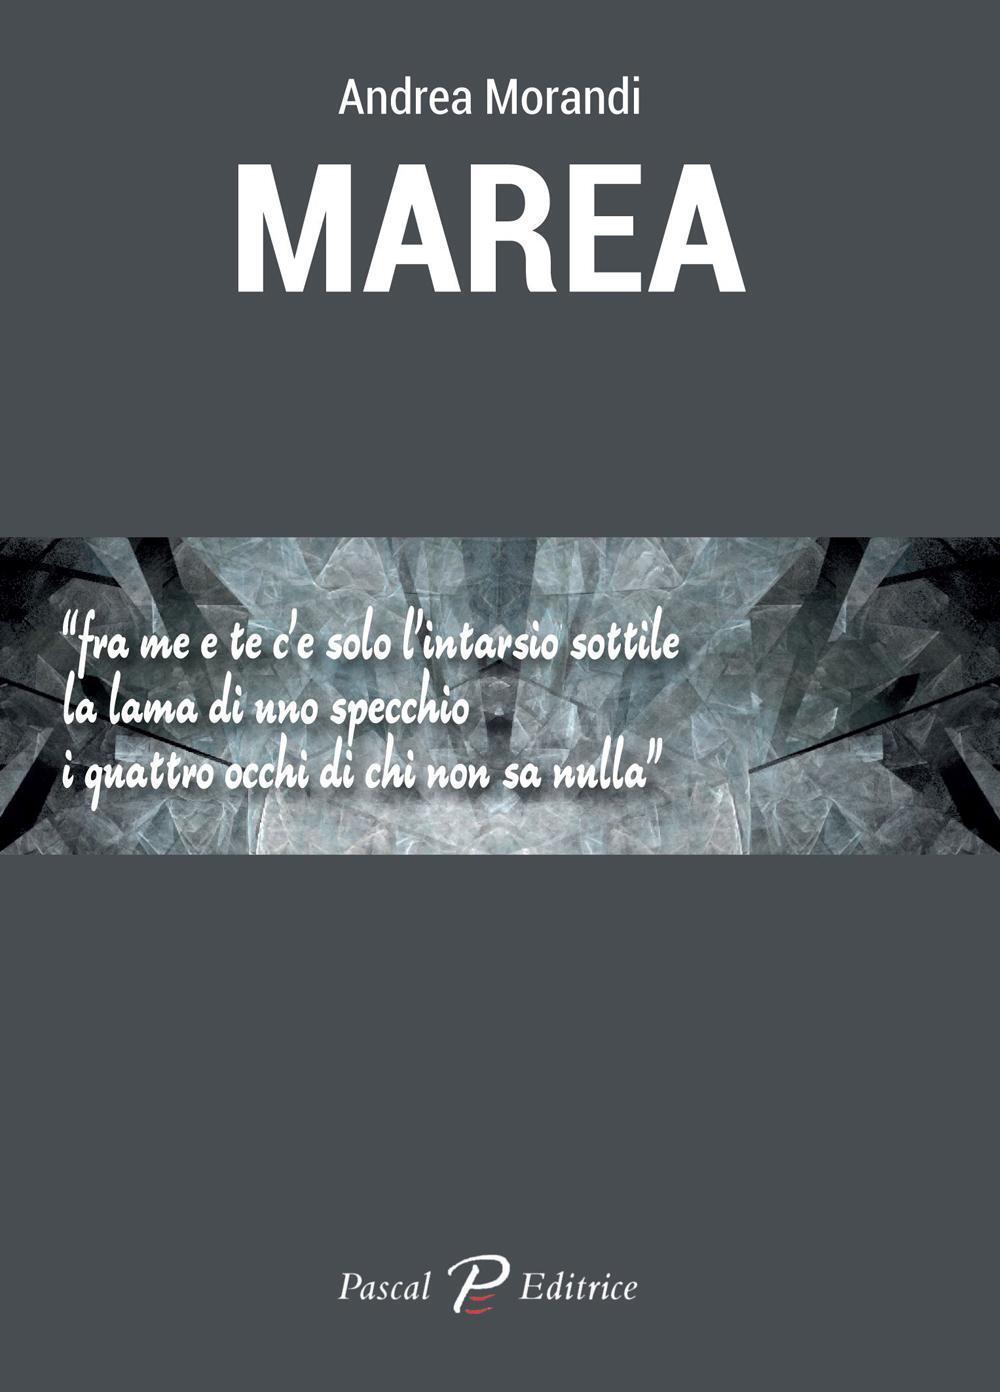 Marea - Andrea Morandi - Libro - Pascal - | IBS